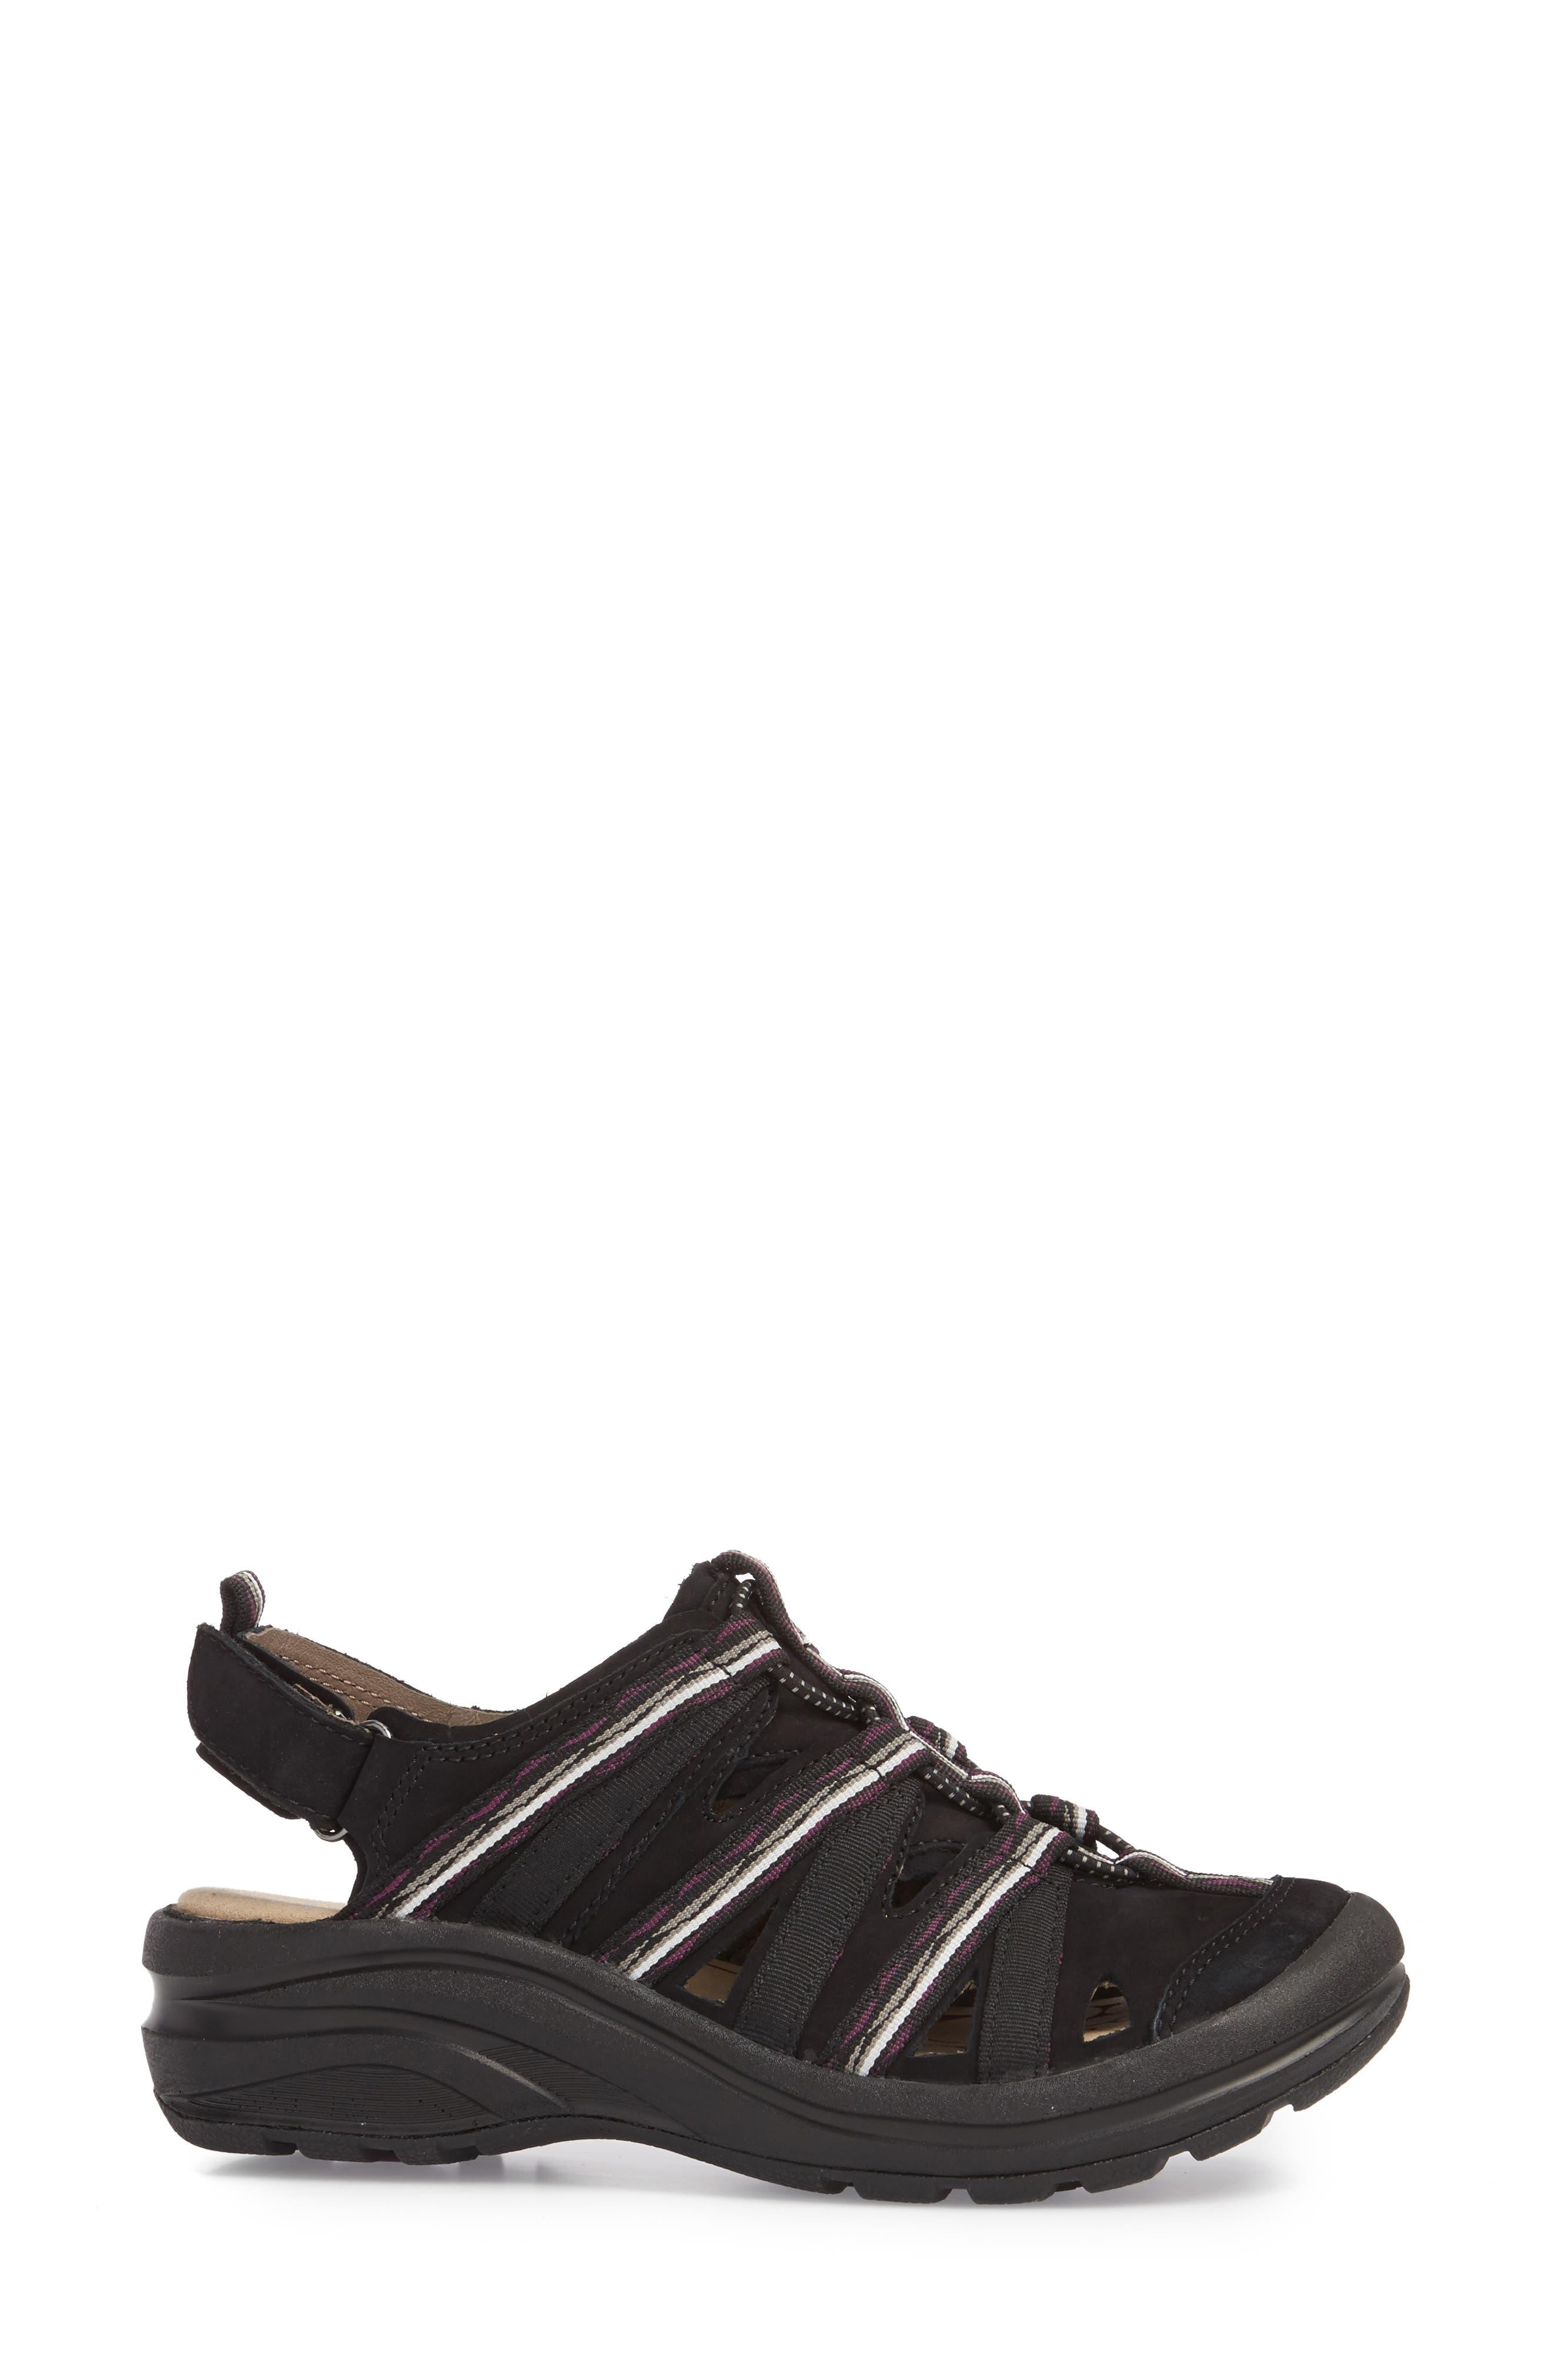 Malabar Sport Sandal,                             Alternate thumbnail 3, color,                             BLACK LEATHER